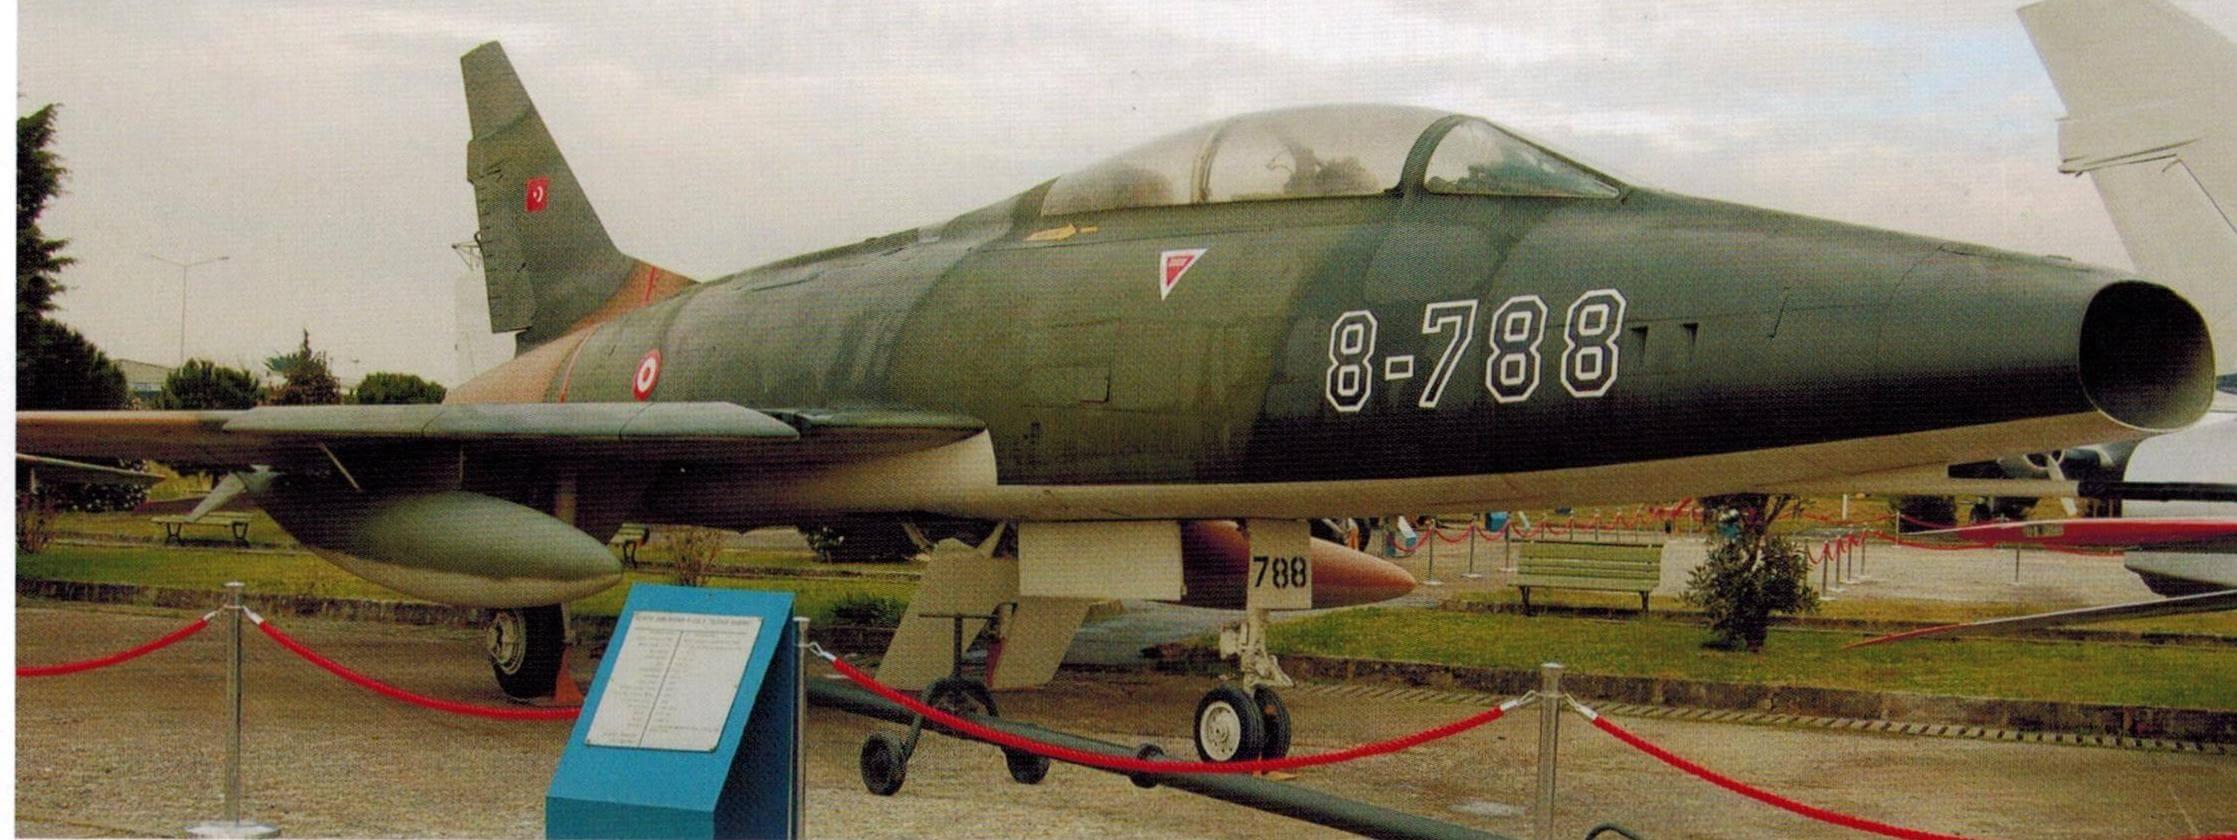 Истребитель Норт Америкэн F-100D «Супер Сейбр»